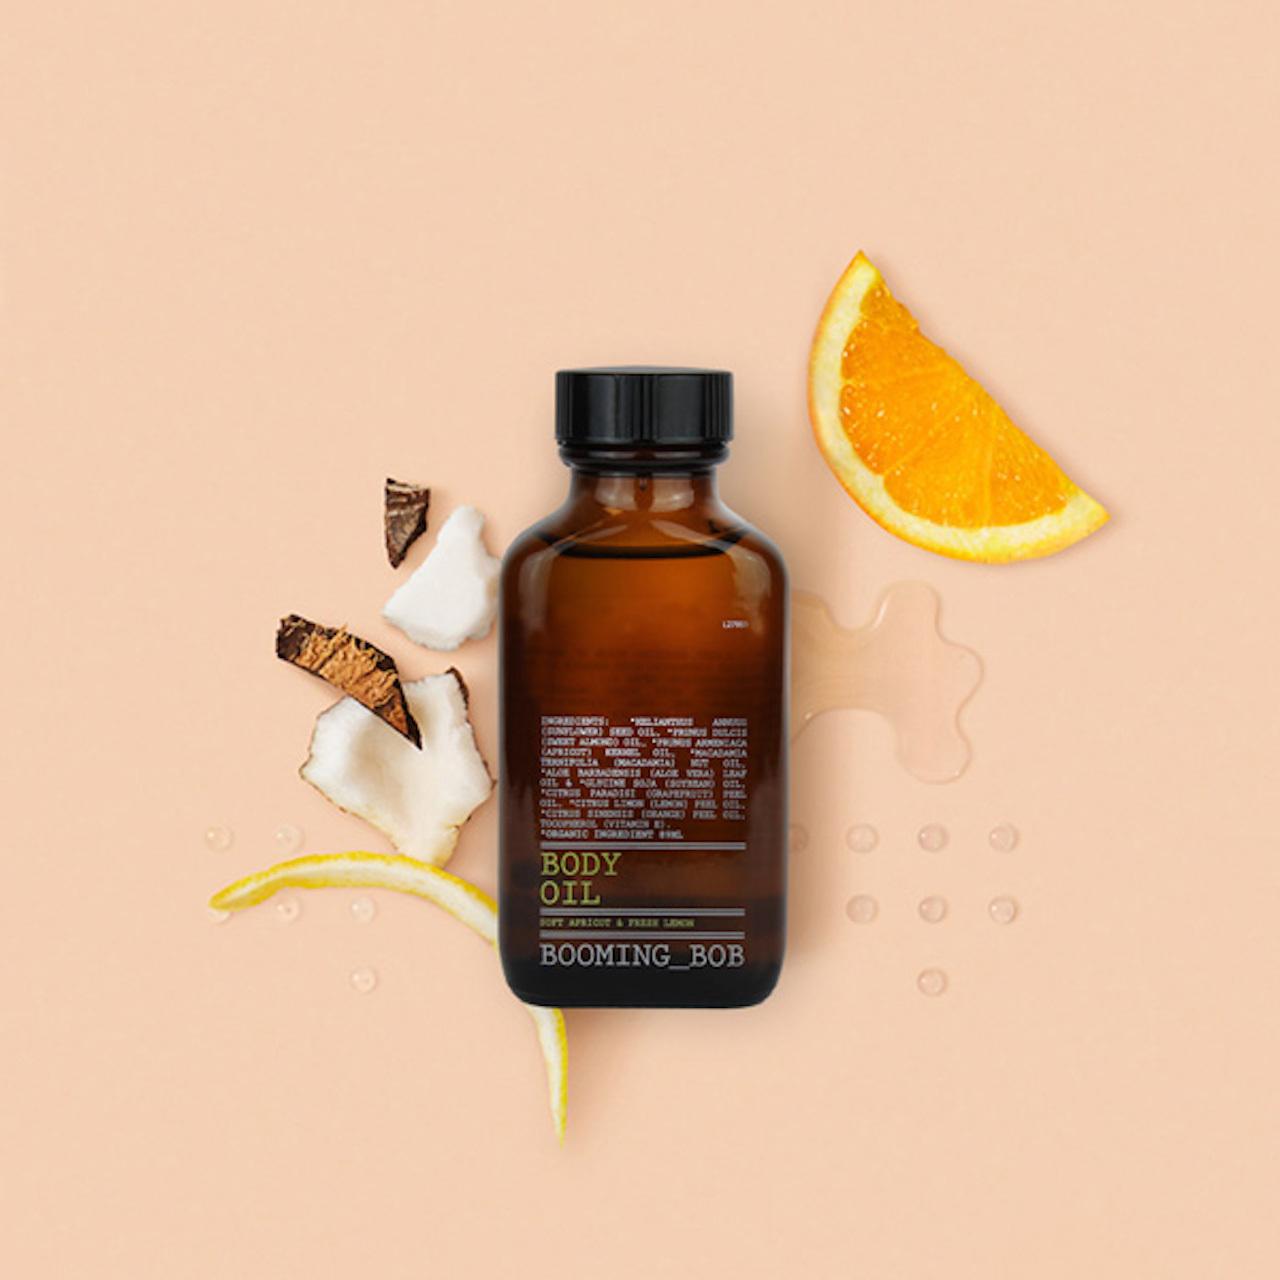 """ BOOMING_BOB organic Body oil / ブーミングボブ オーガニックボディオイル【フレッシュレモン】89ml """